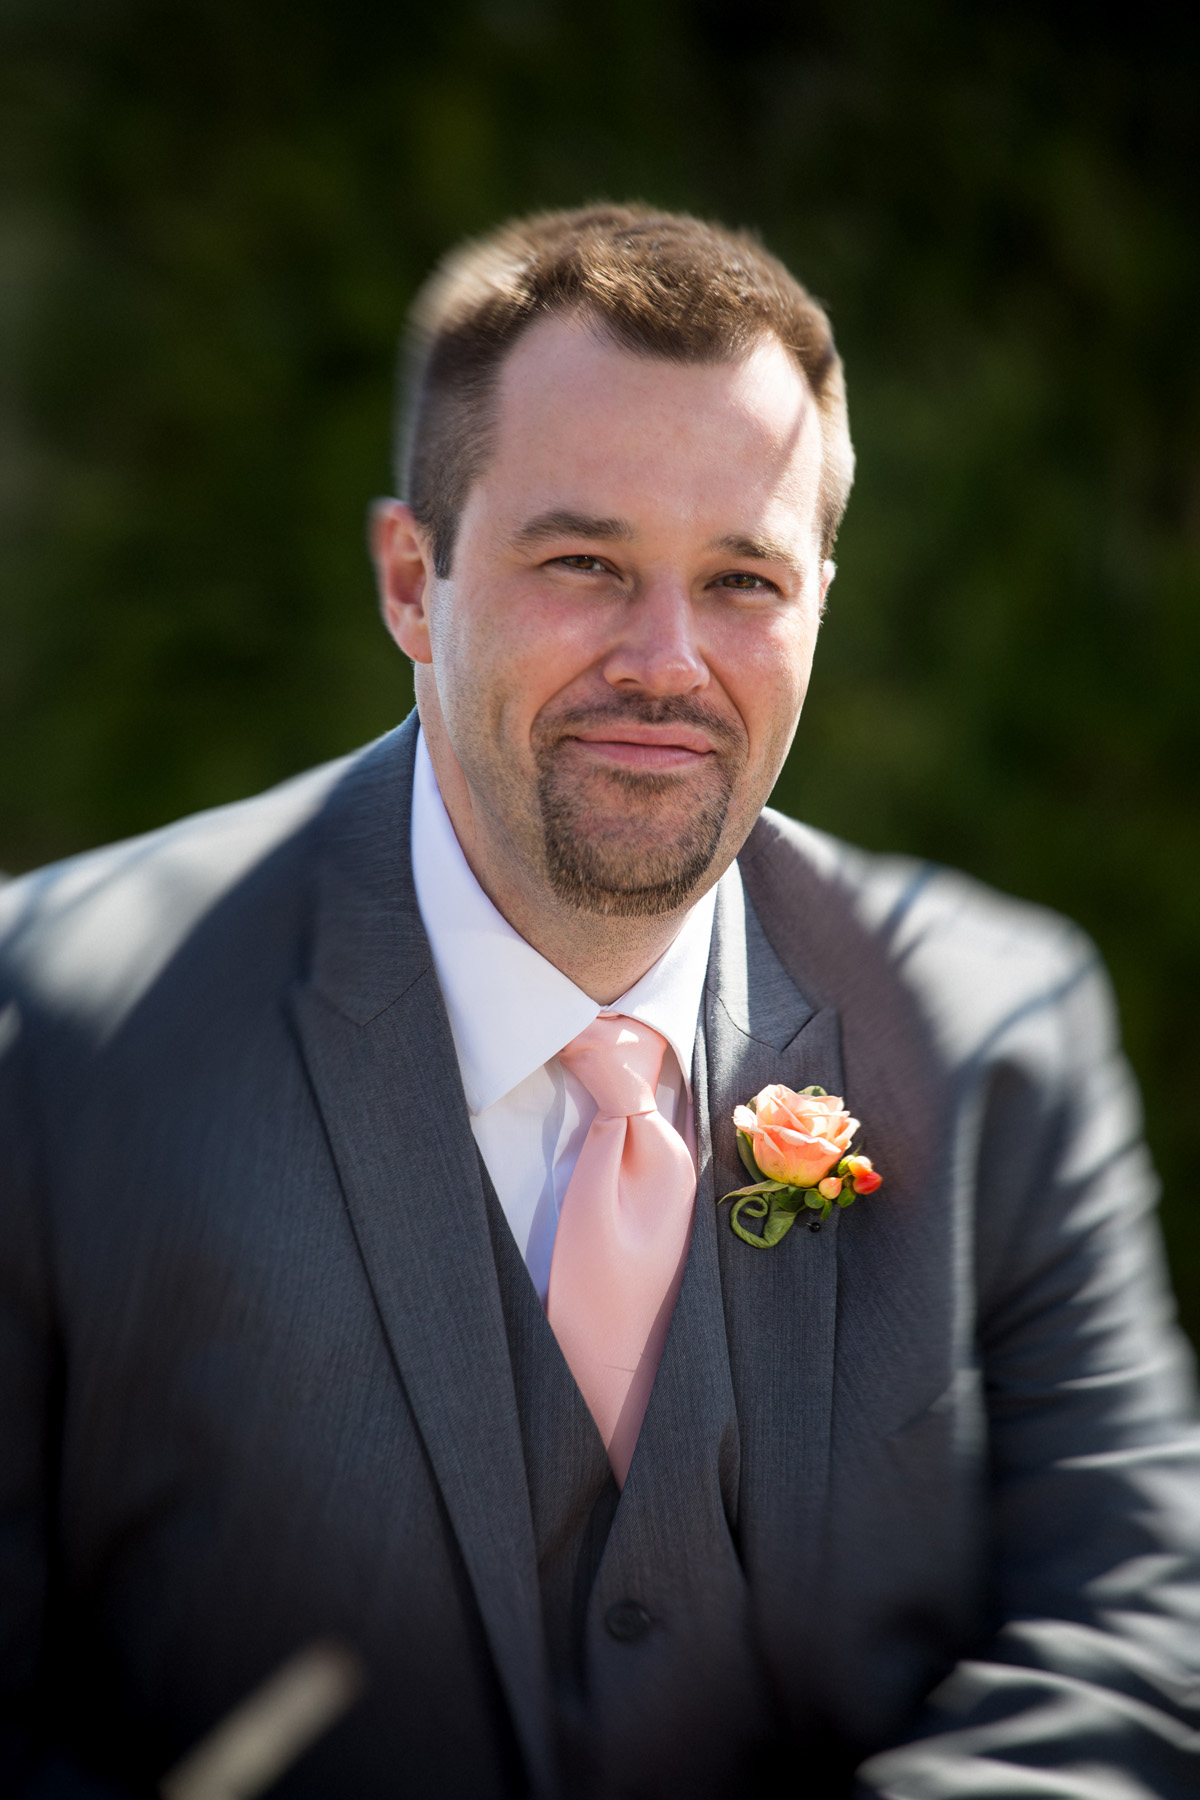 Wedding portrait of groom at Samoset Resort in Rockland, Maine.  Wedding photographer Will of Focus Photography.